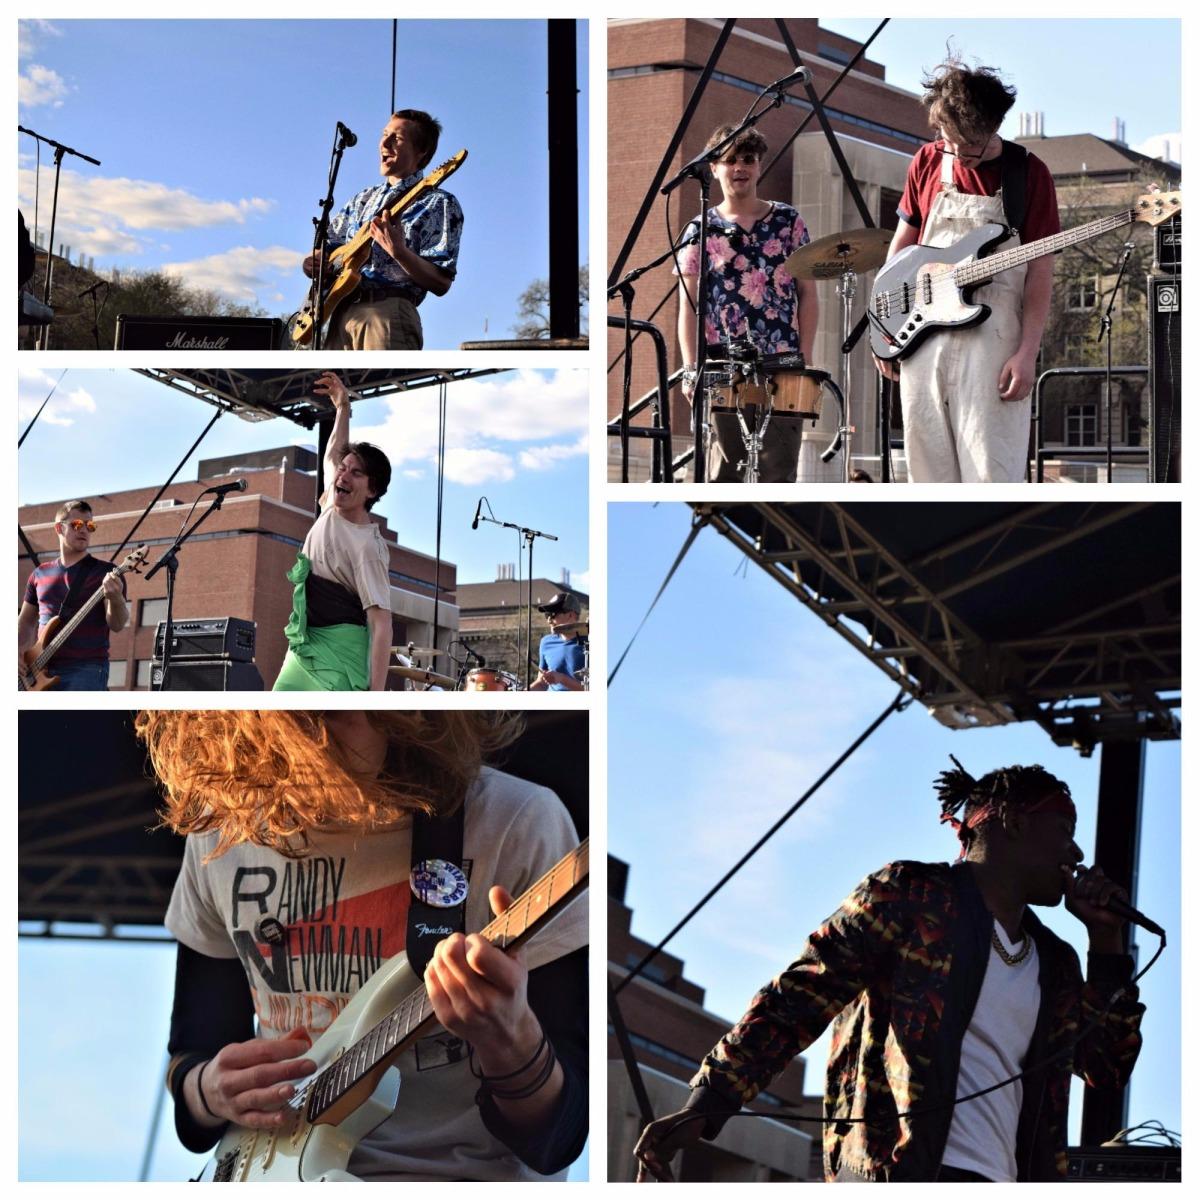 Battle of the Bands: Final Battle @ Coffman Plaza4/21/17